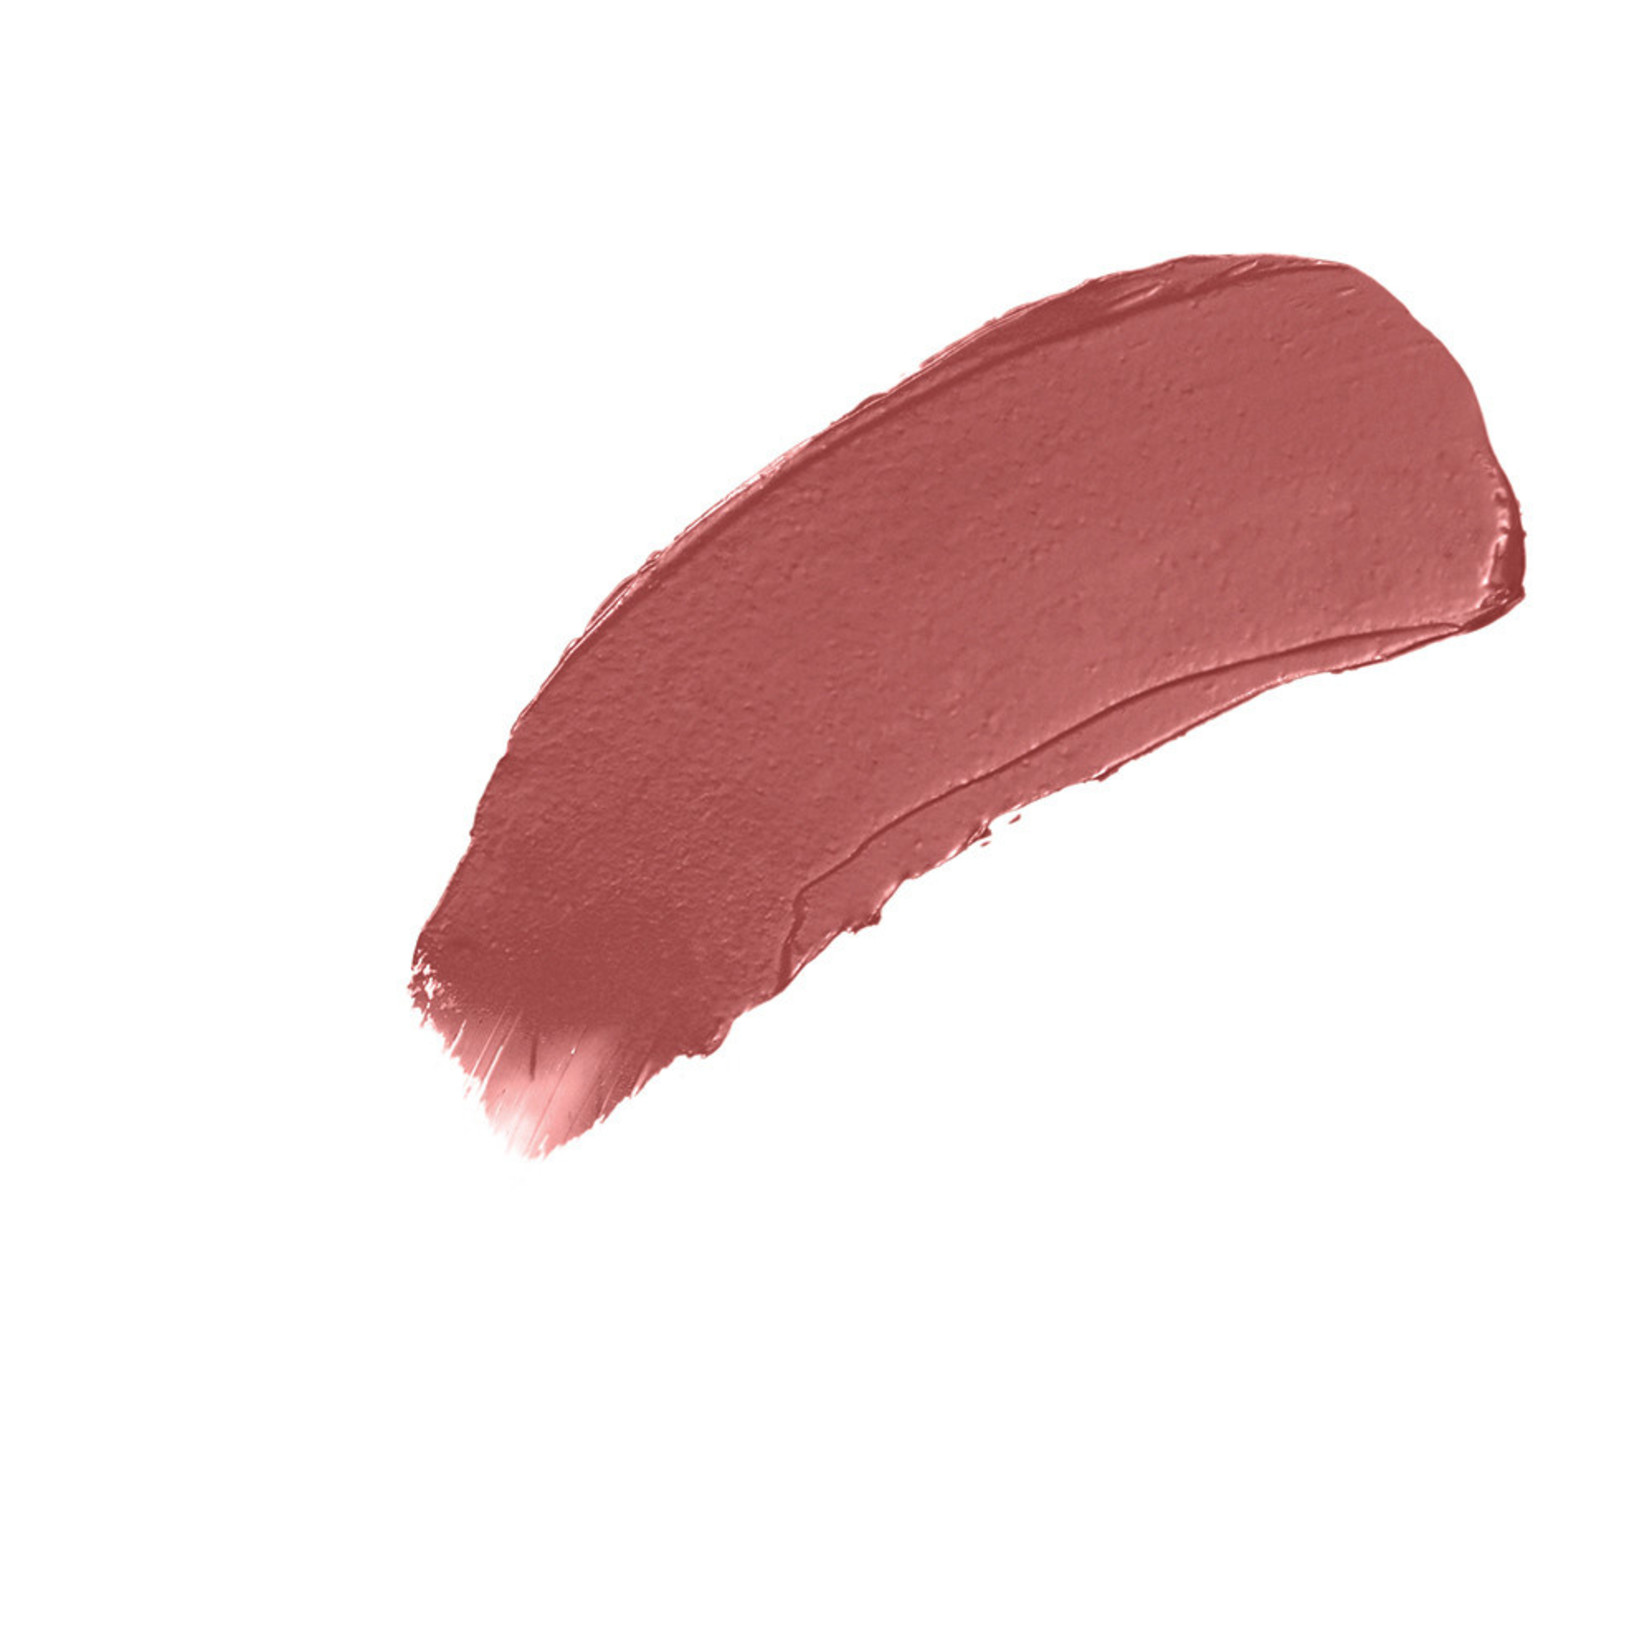 Triple luxe lipstick gabby